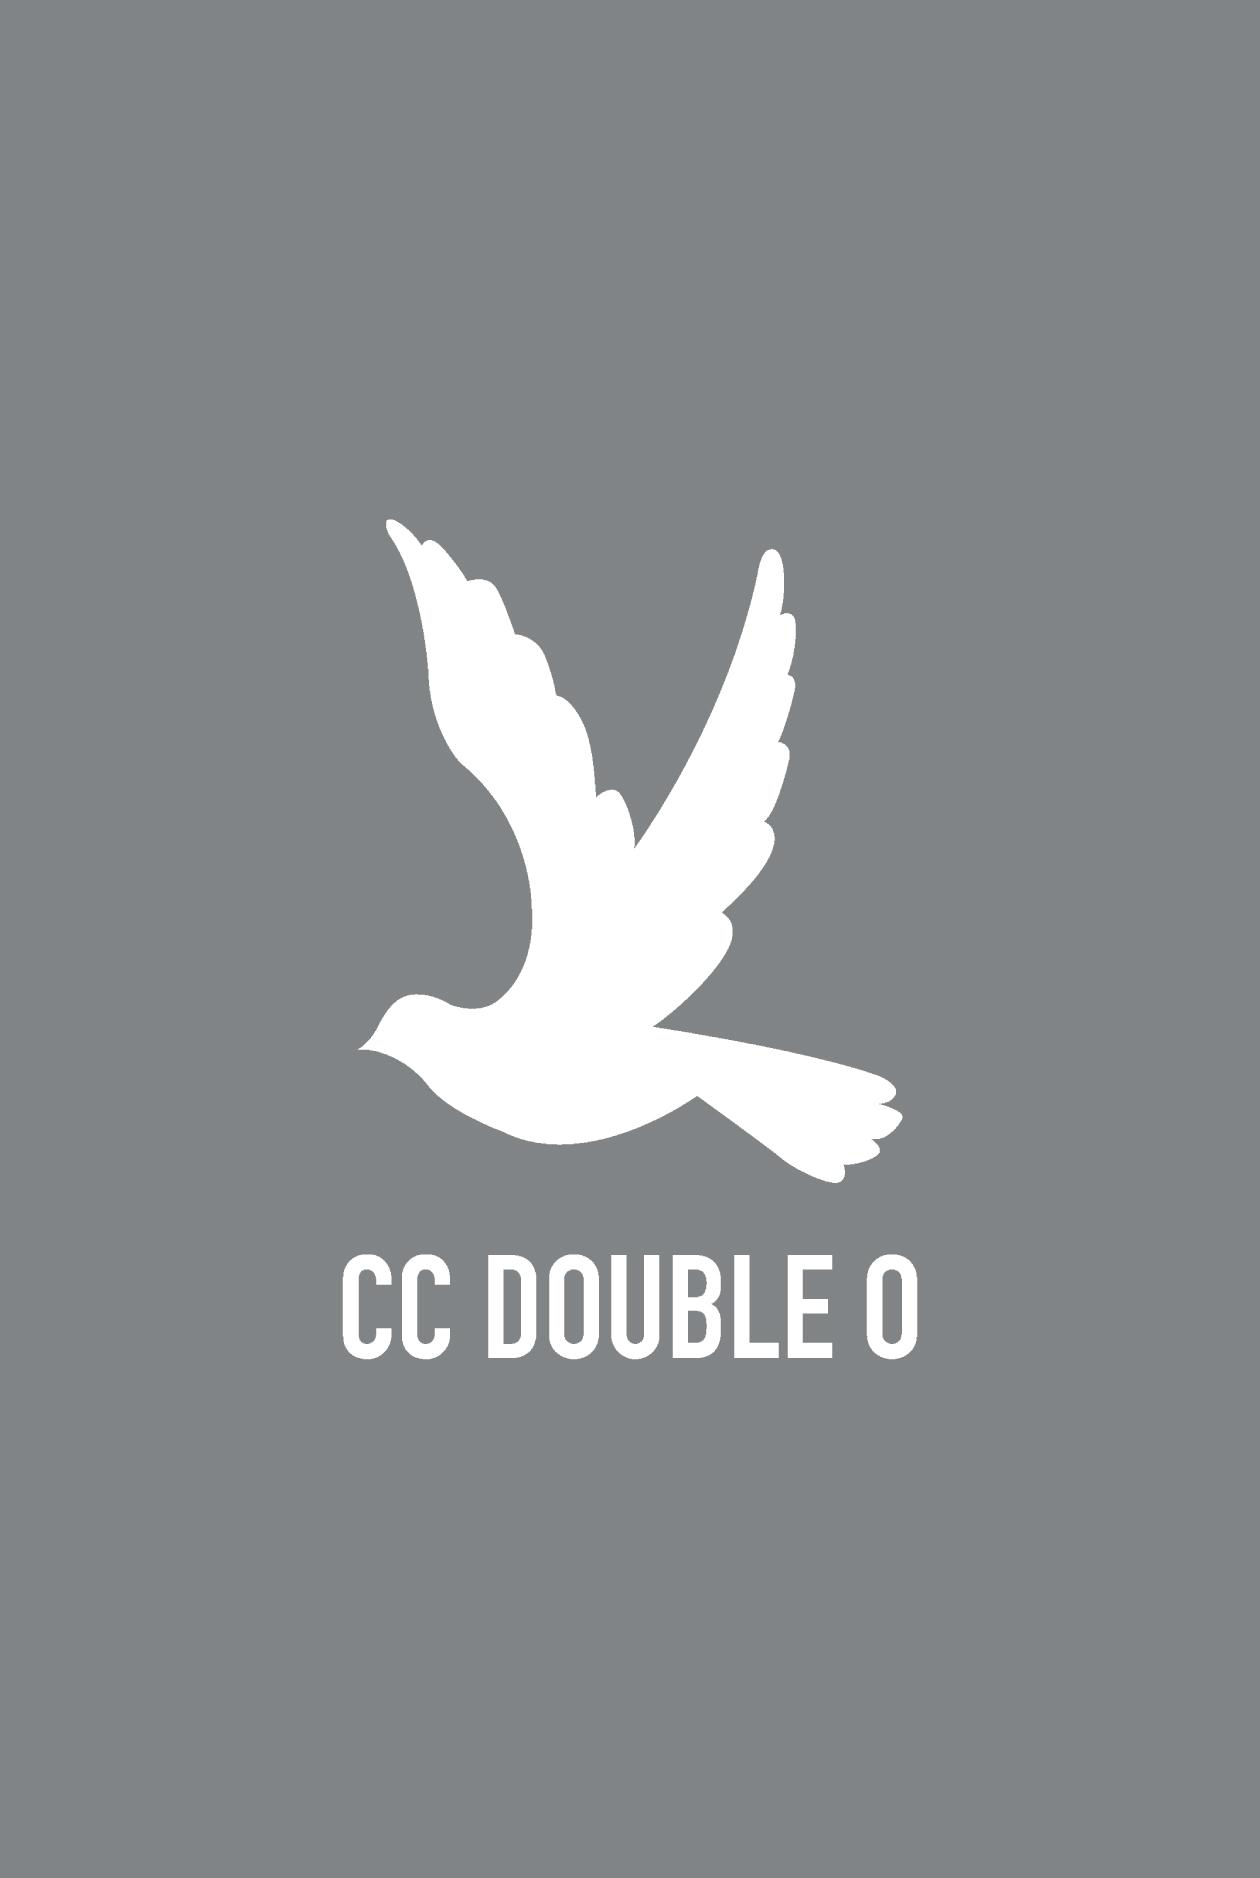 Logo Cap with All-Over CC DOUBLE O Logo detail